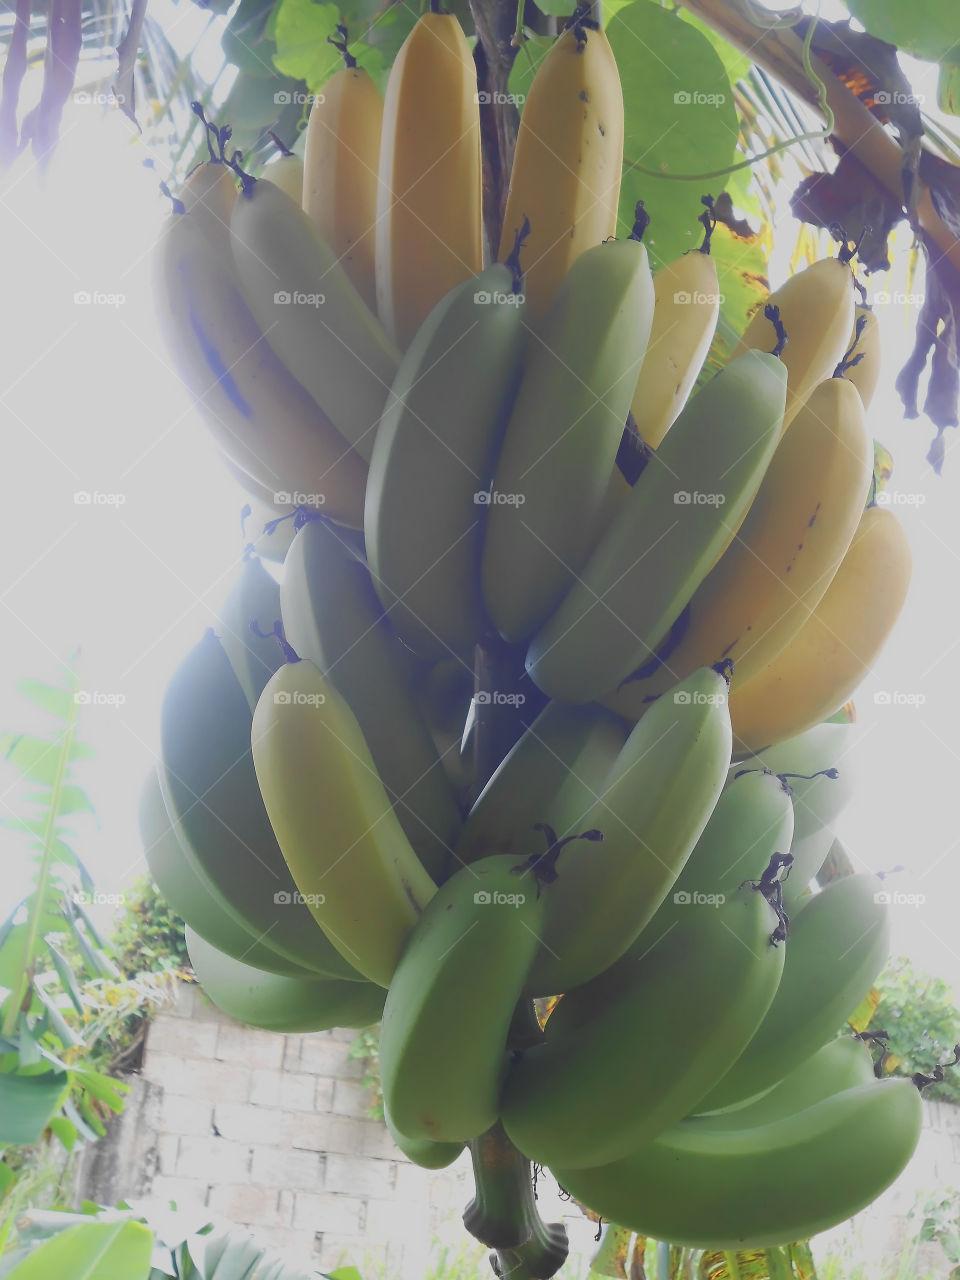 Sunlight Effect on Banana Bunch